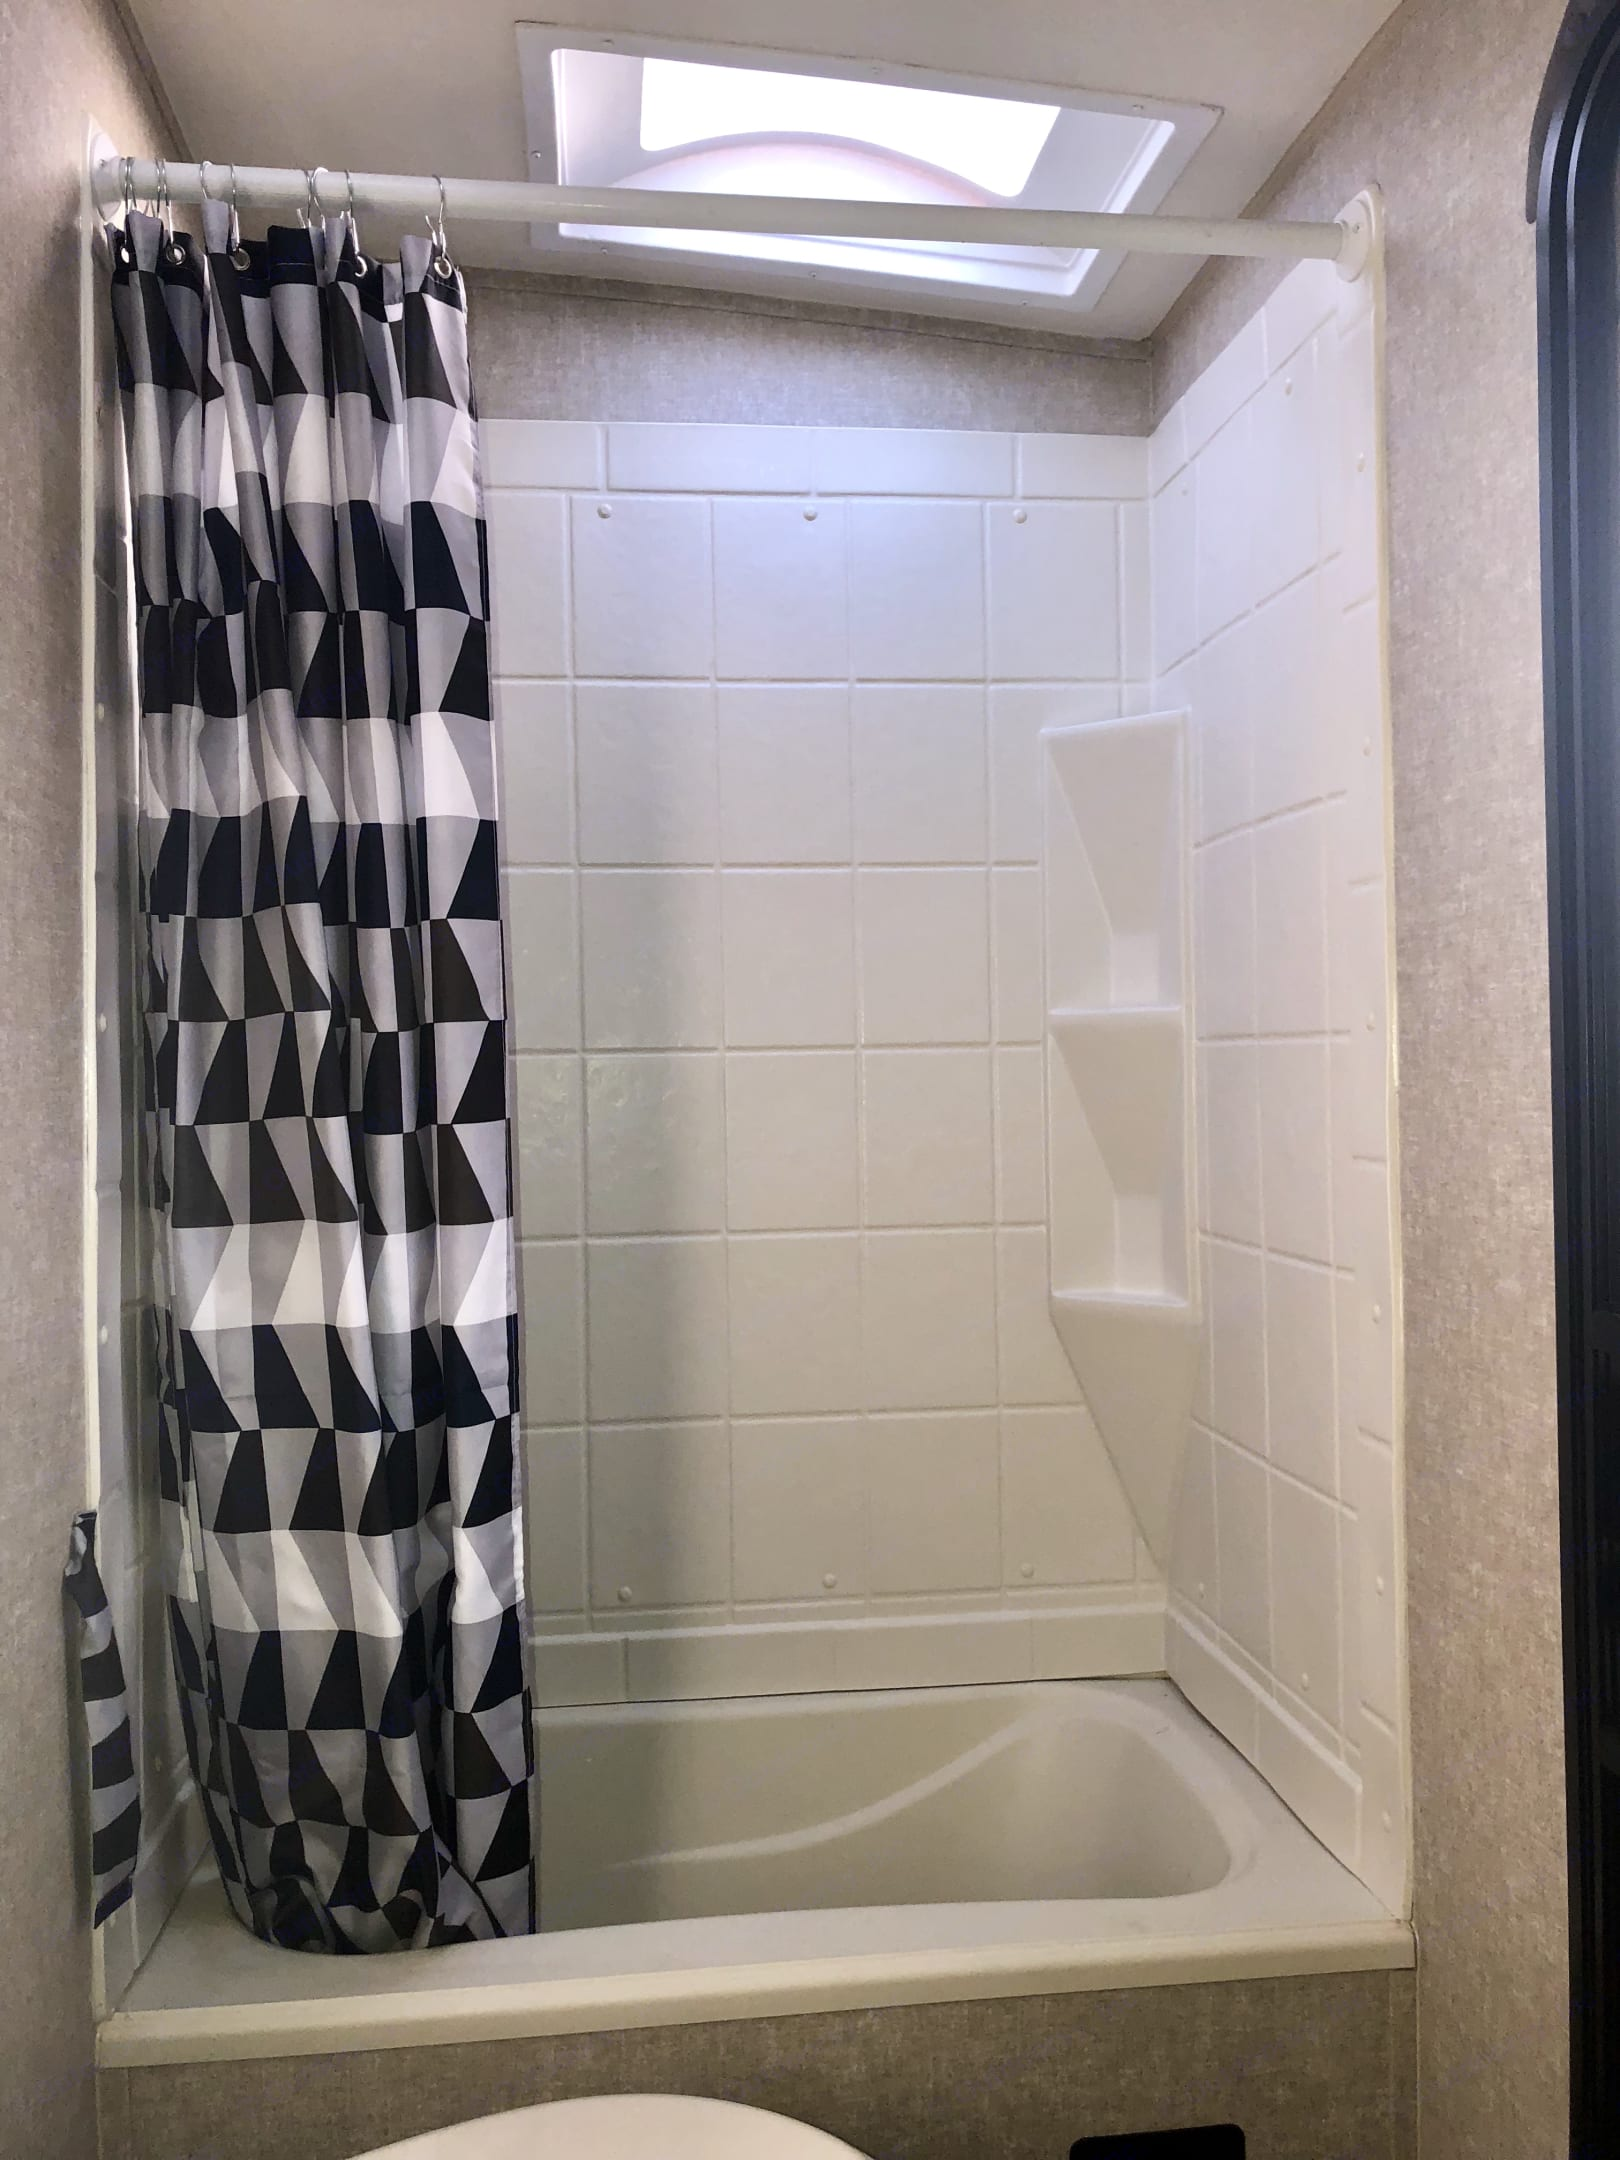 Shower/tub. Forest River Vibe 2017